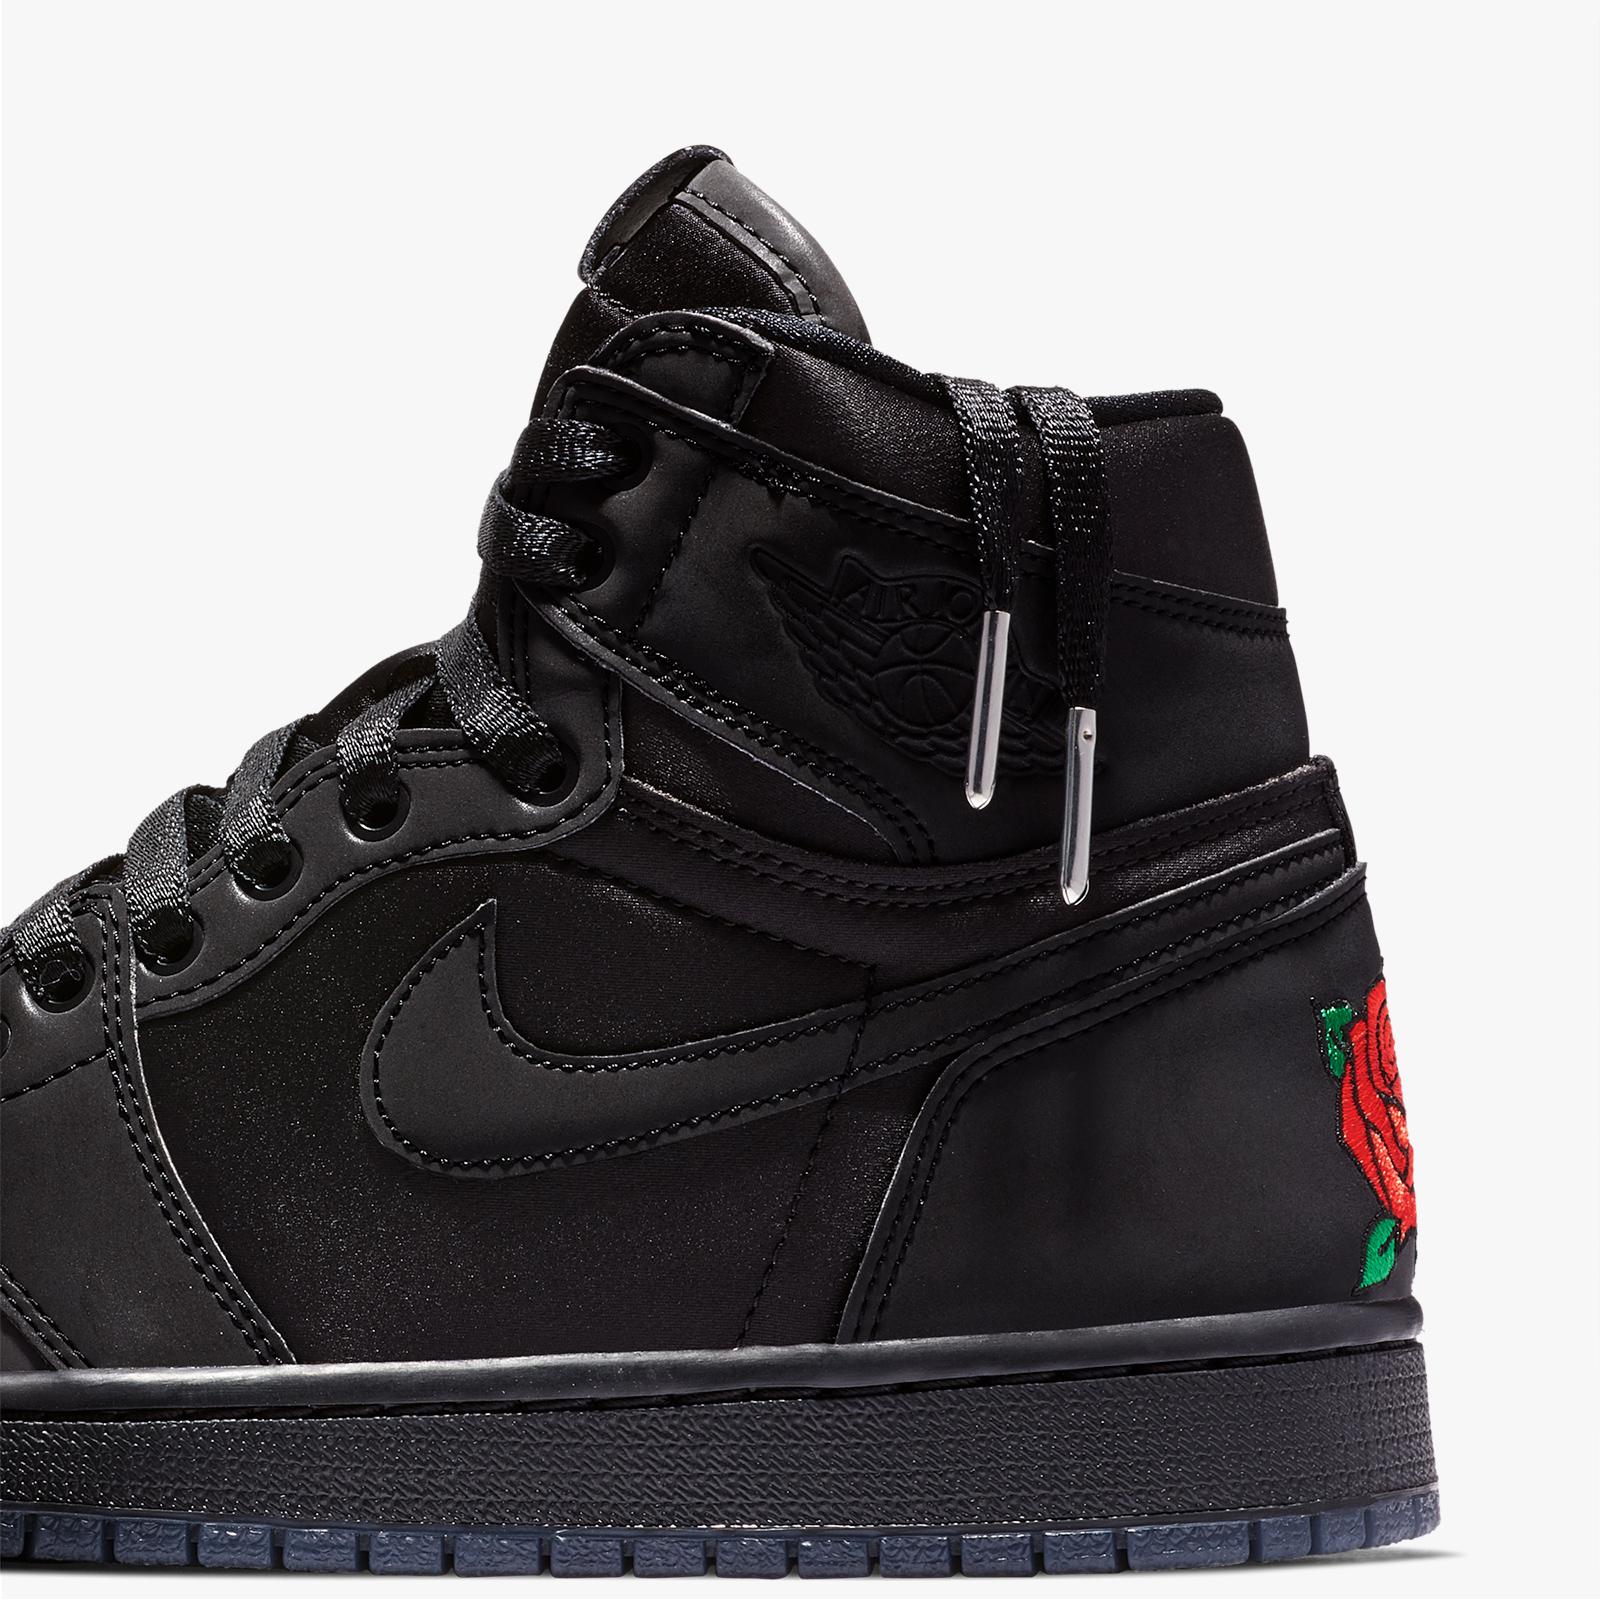 5a15b921ea4ad6 Jordan Brand Wmns Air Jordan 1 Retro High - Bv1576-001 - Sneakersnstuff